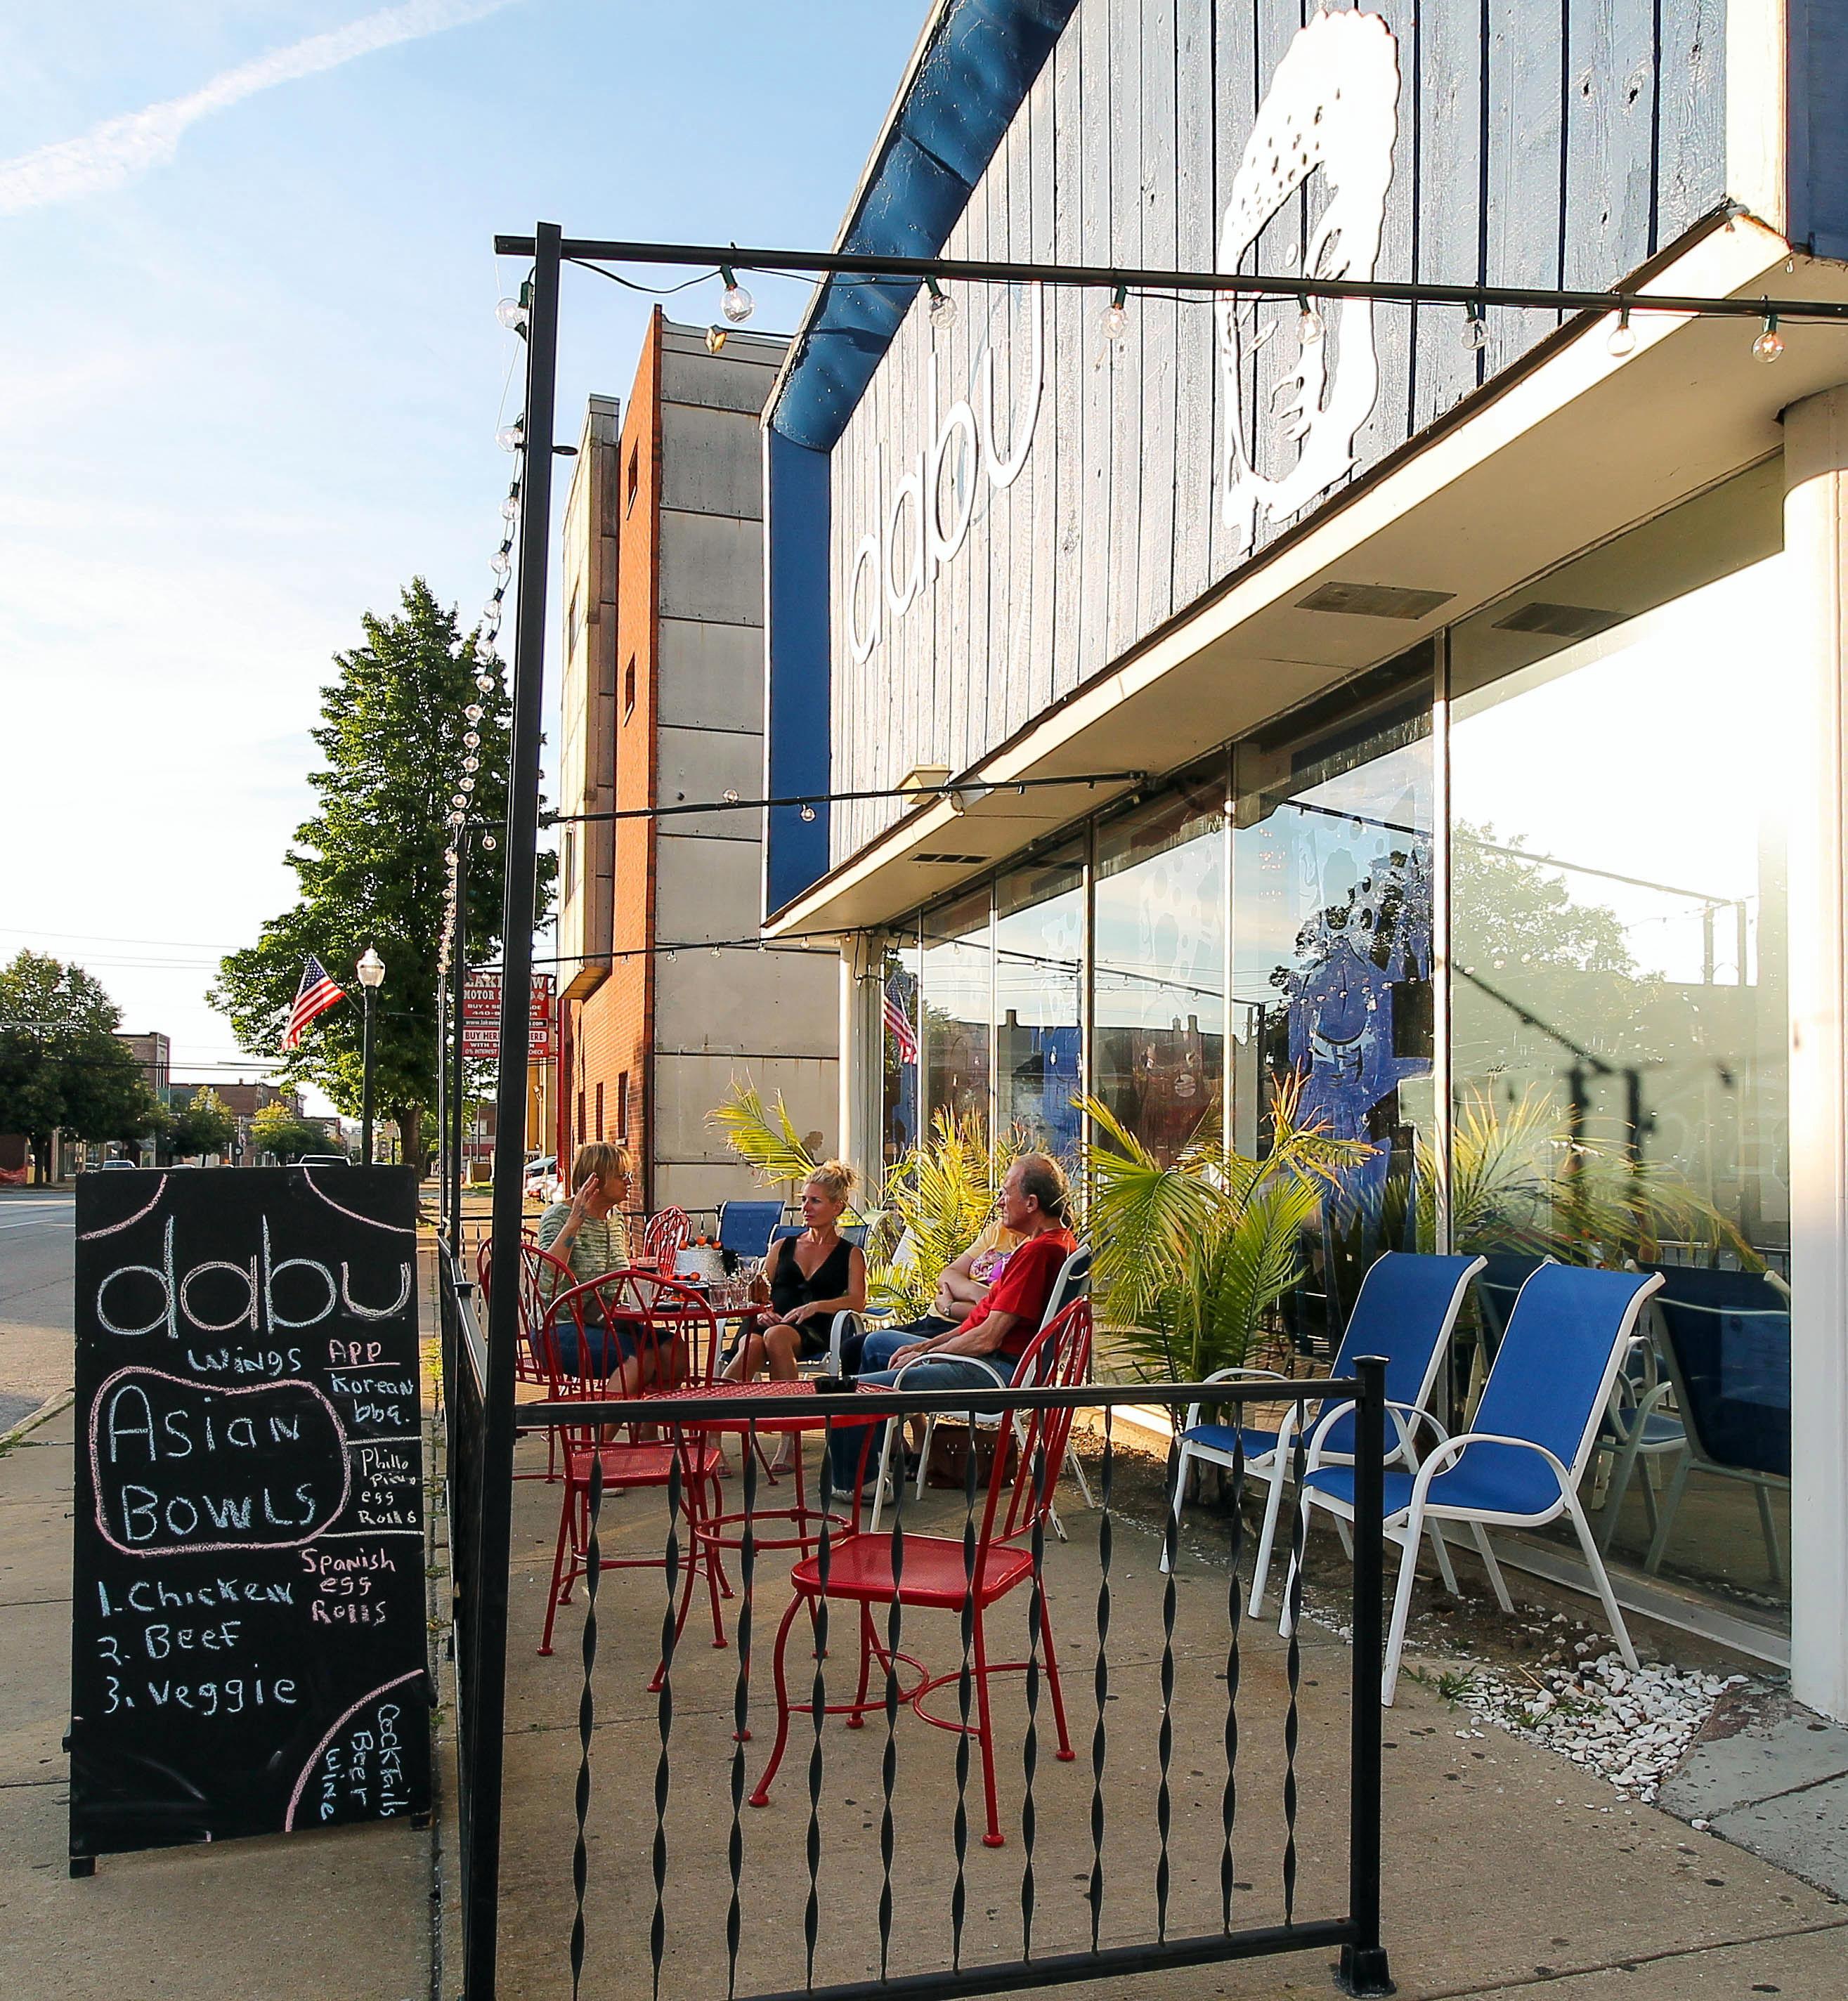 Dabu Restaurant West Midlands